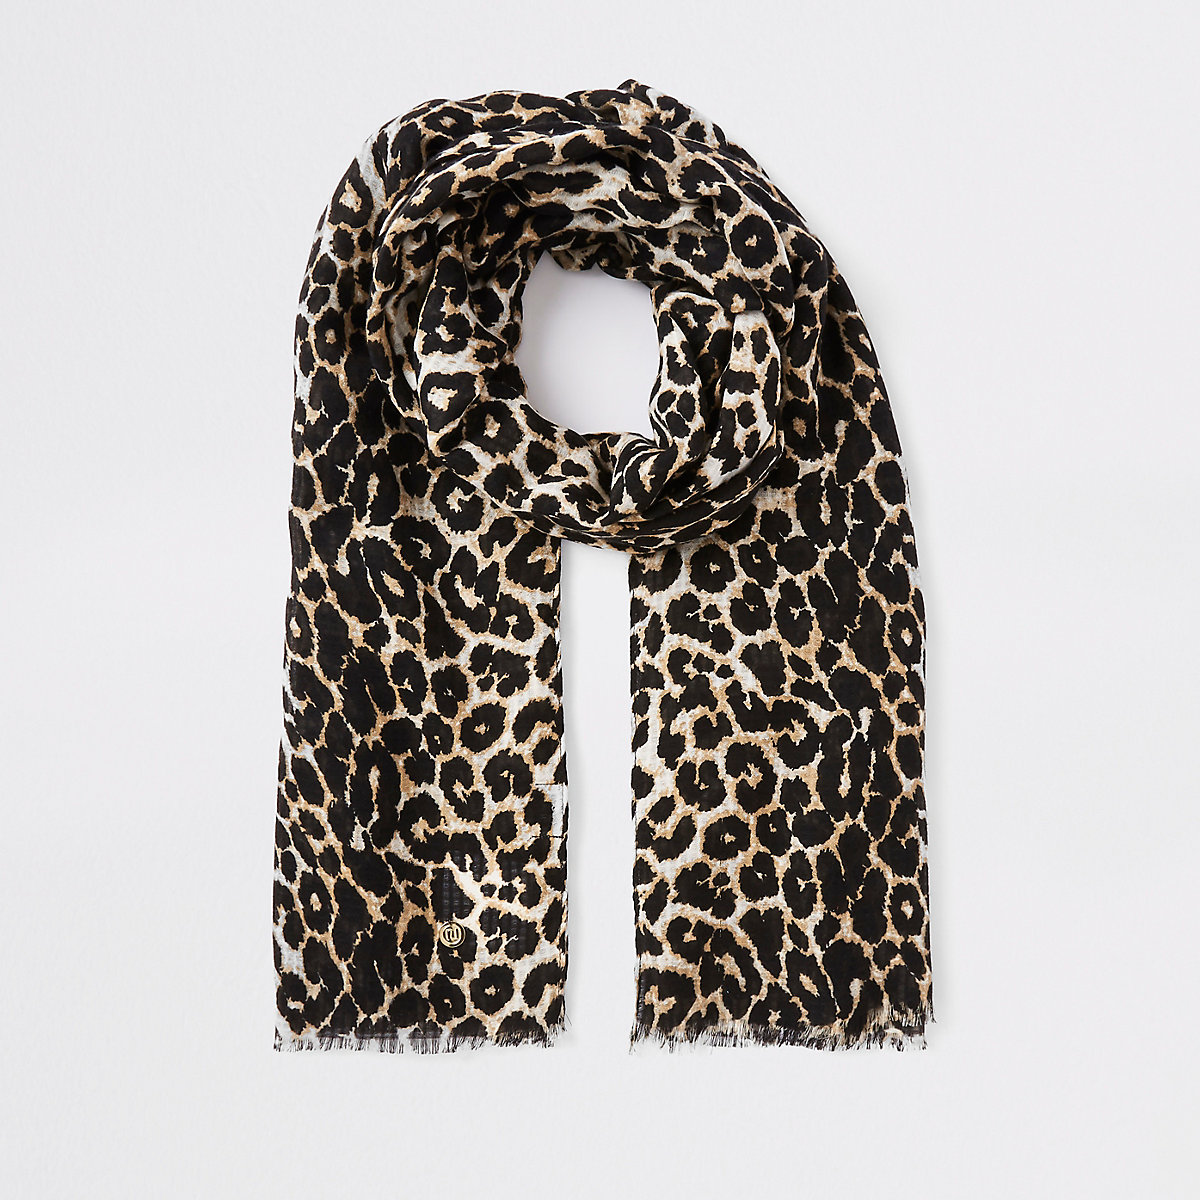 8600a40abc3a Écharpe imprimé léopard marron Écharpe imprimé léopard marron ...